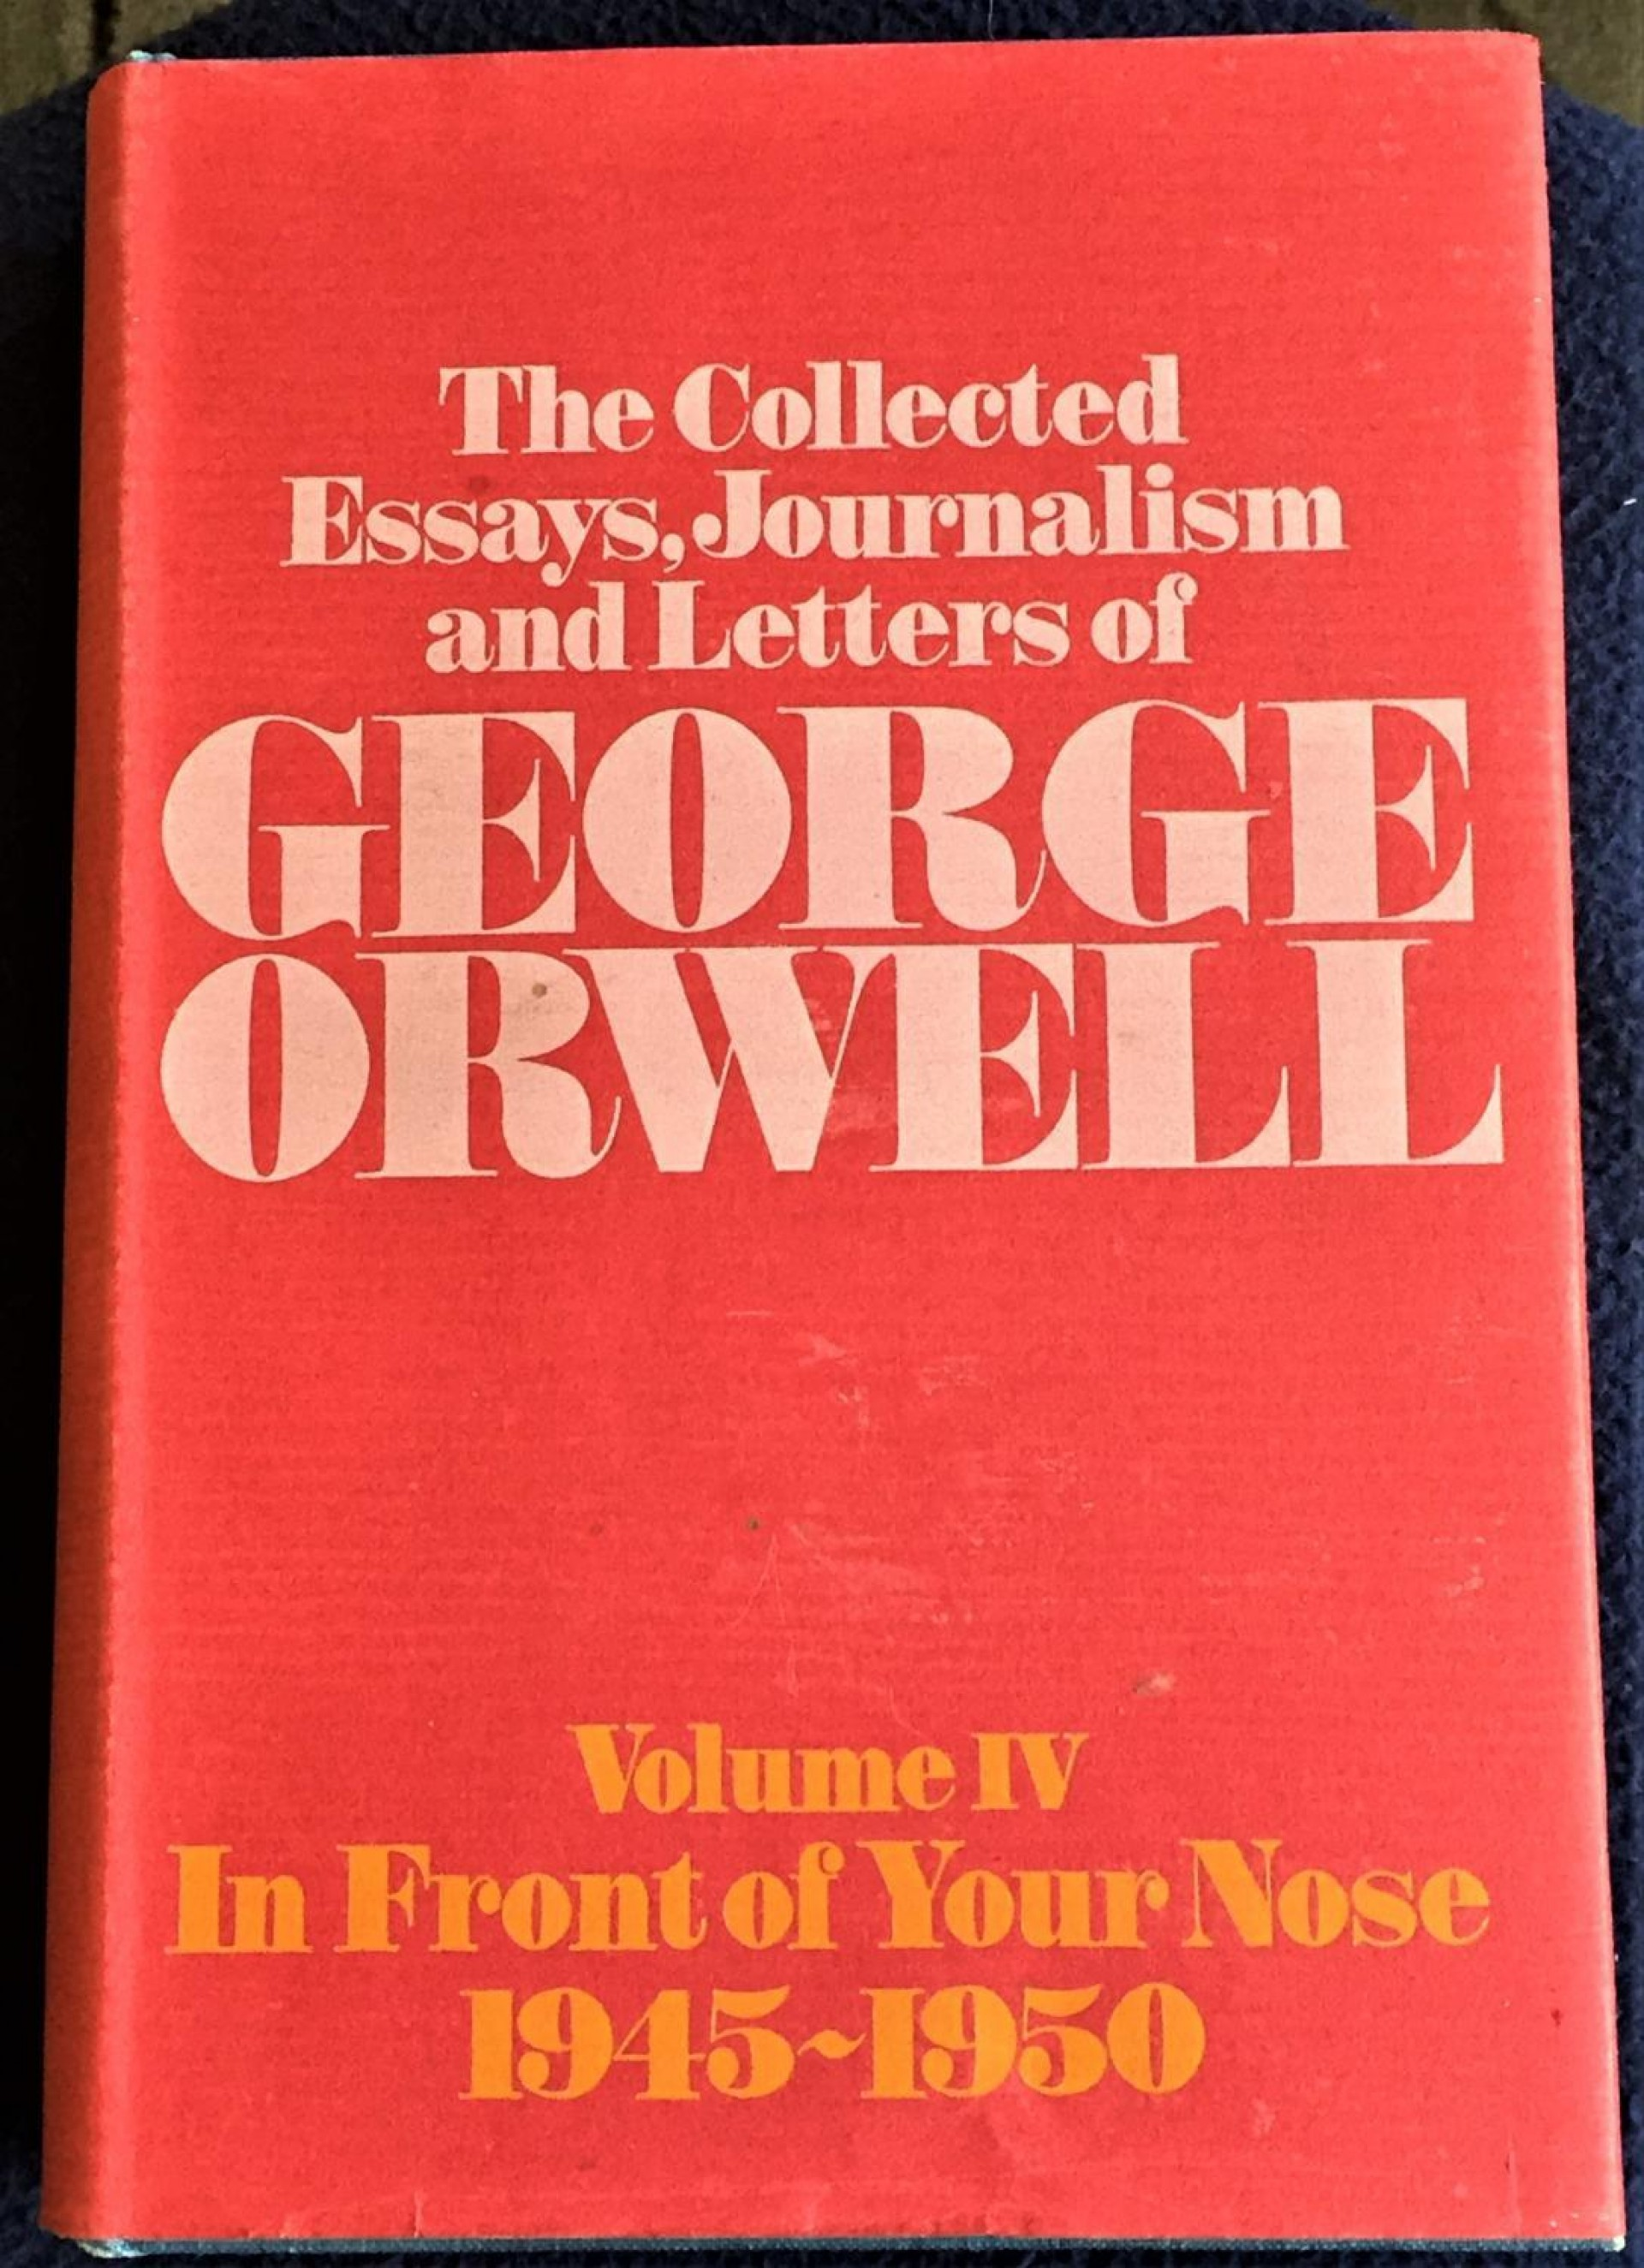 014 George Orwell Essays Essay Frightening Everyman's Library Summary Bookshop Memories 1920